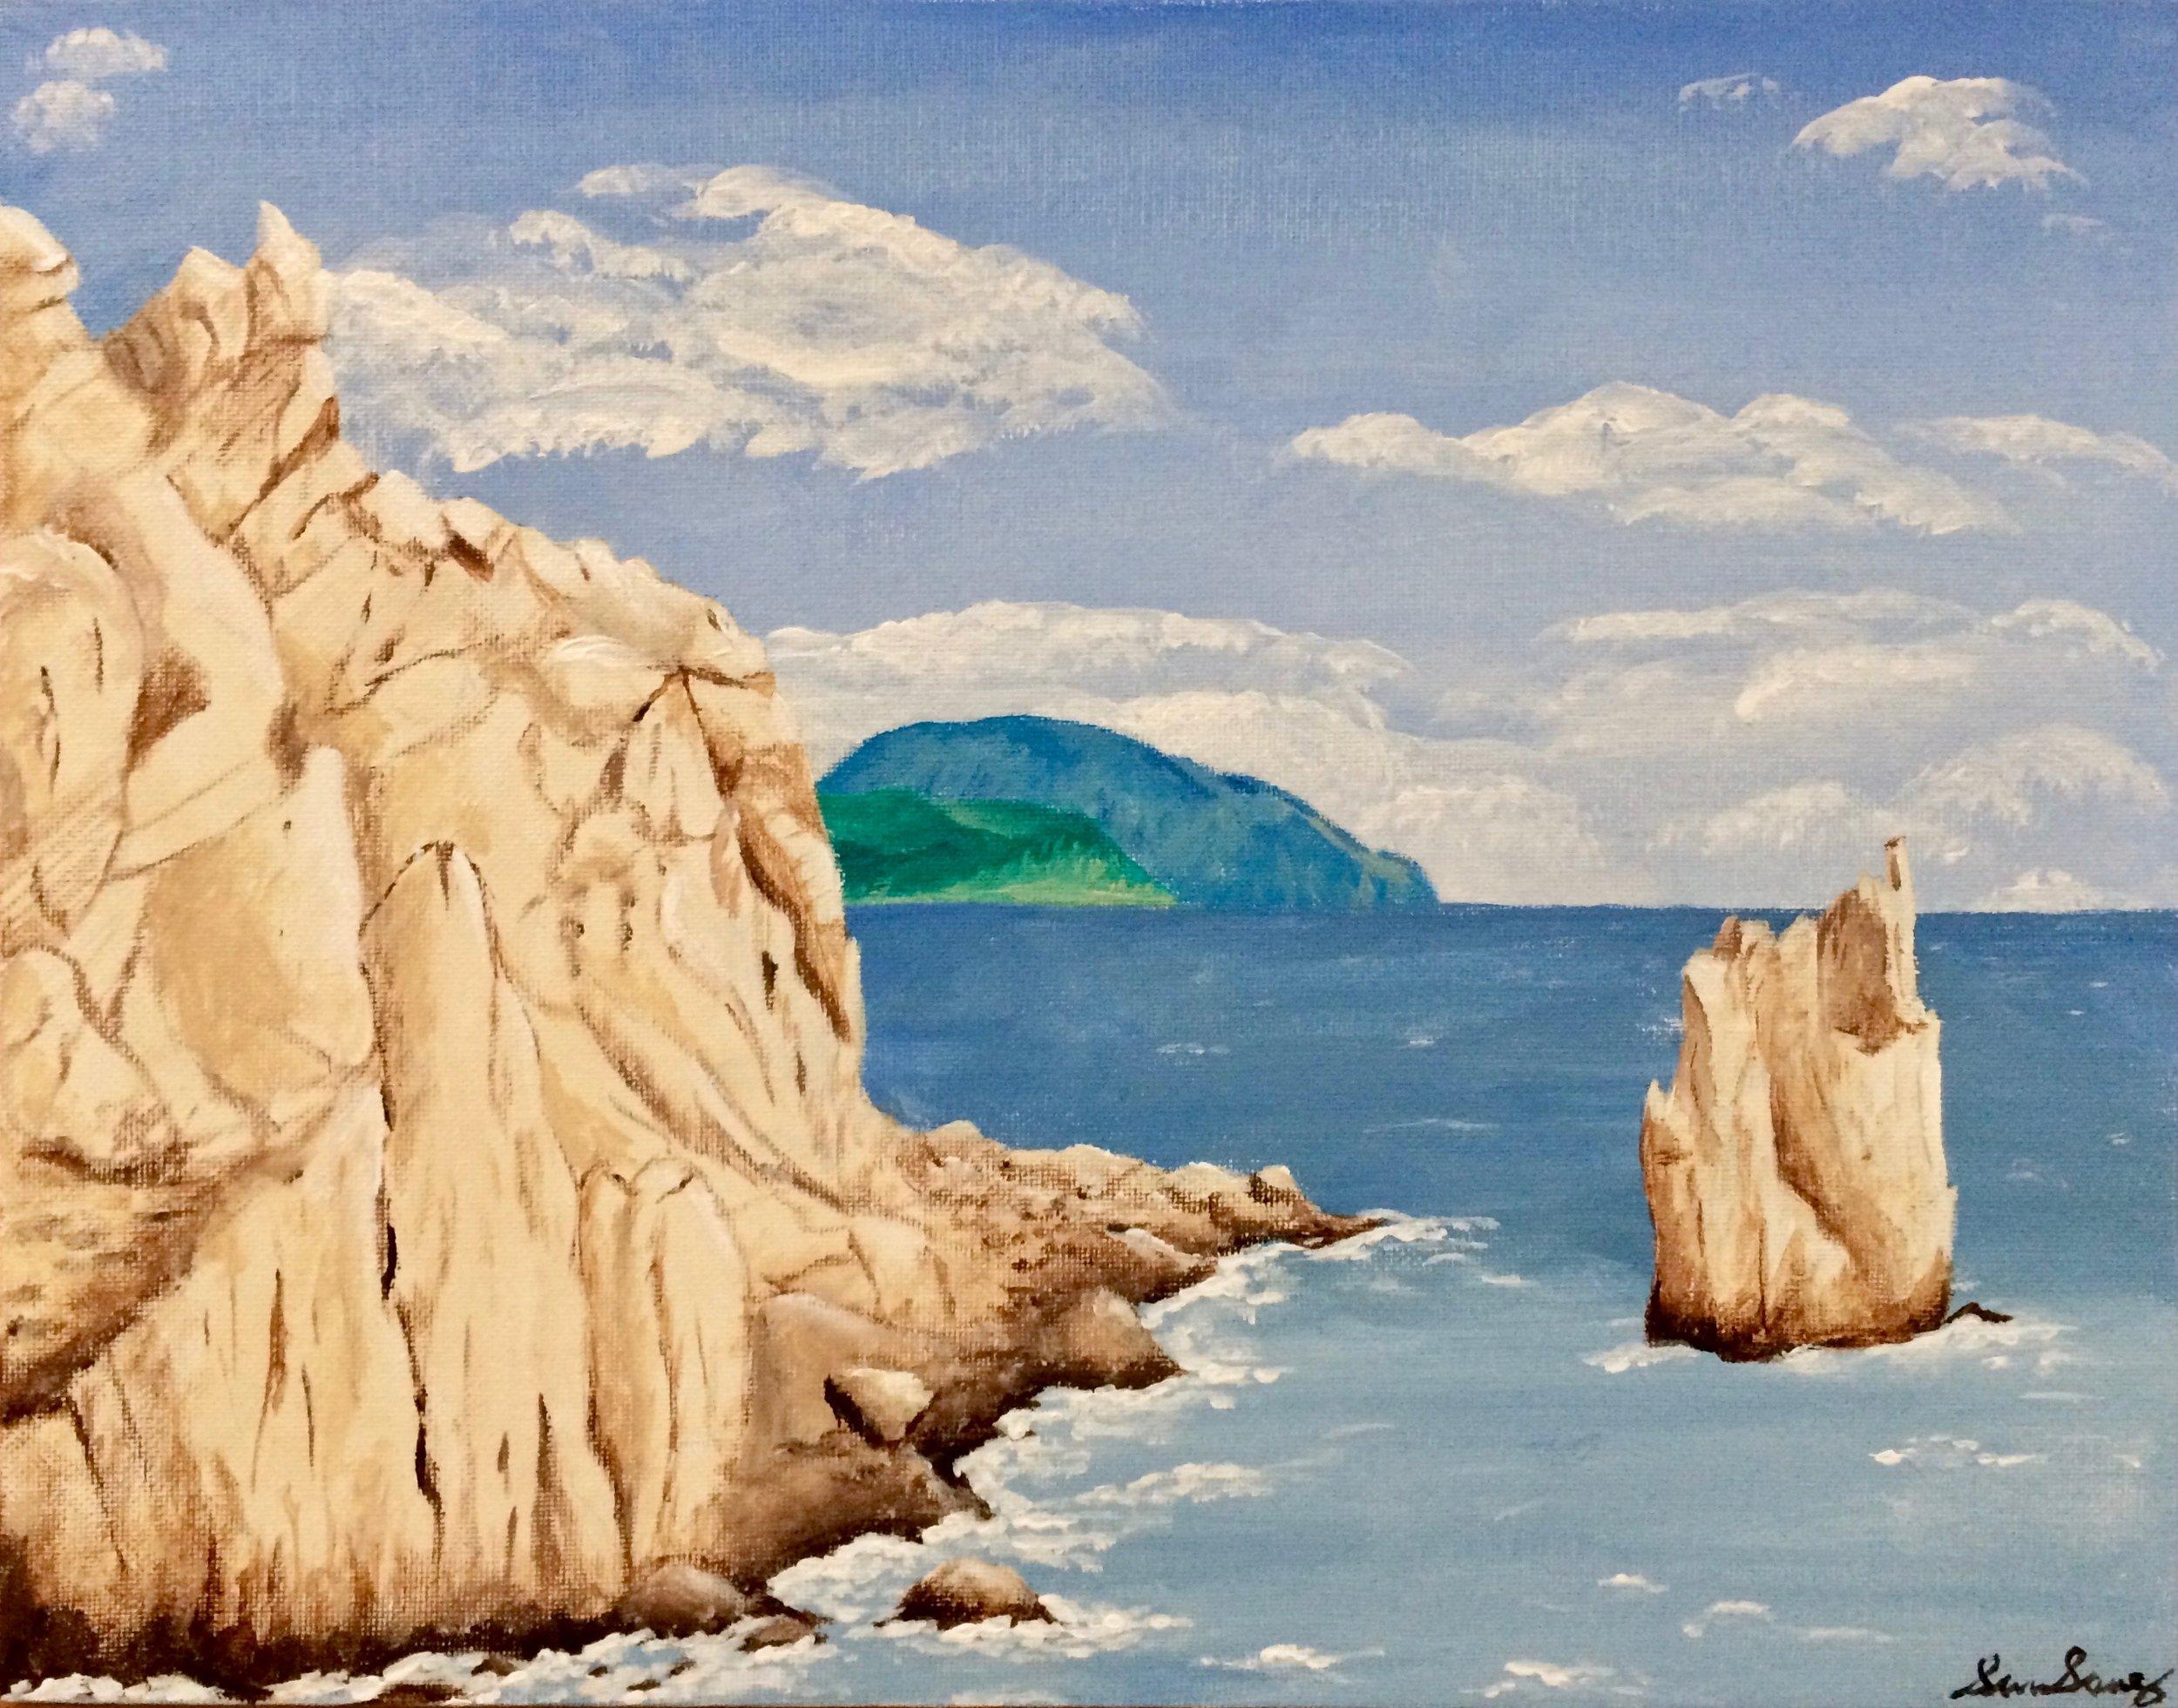 Crimea and the Black Sea (acrylic) - Simru Somnez-Erbil